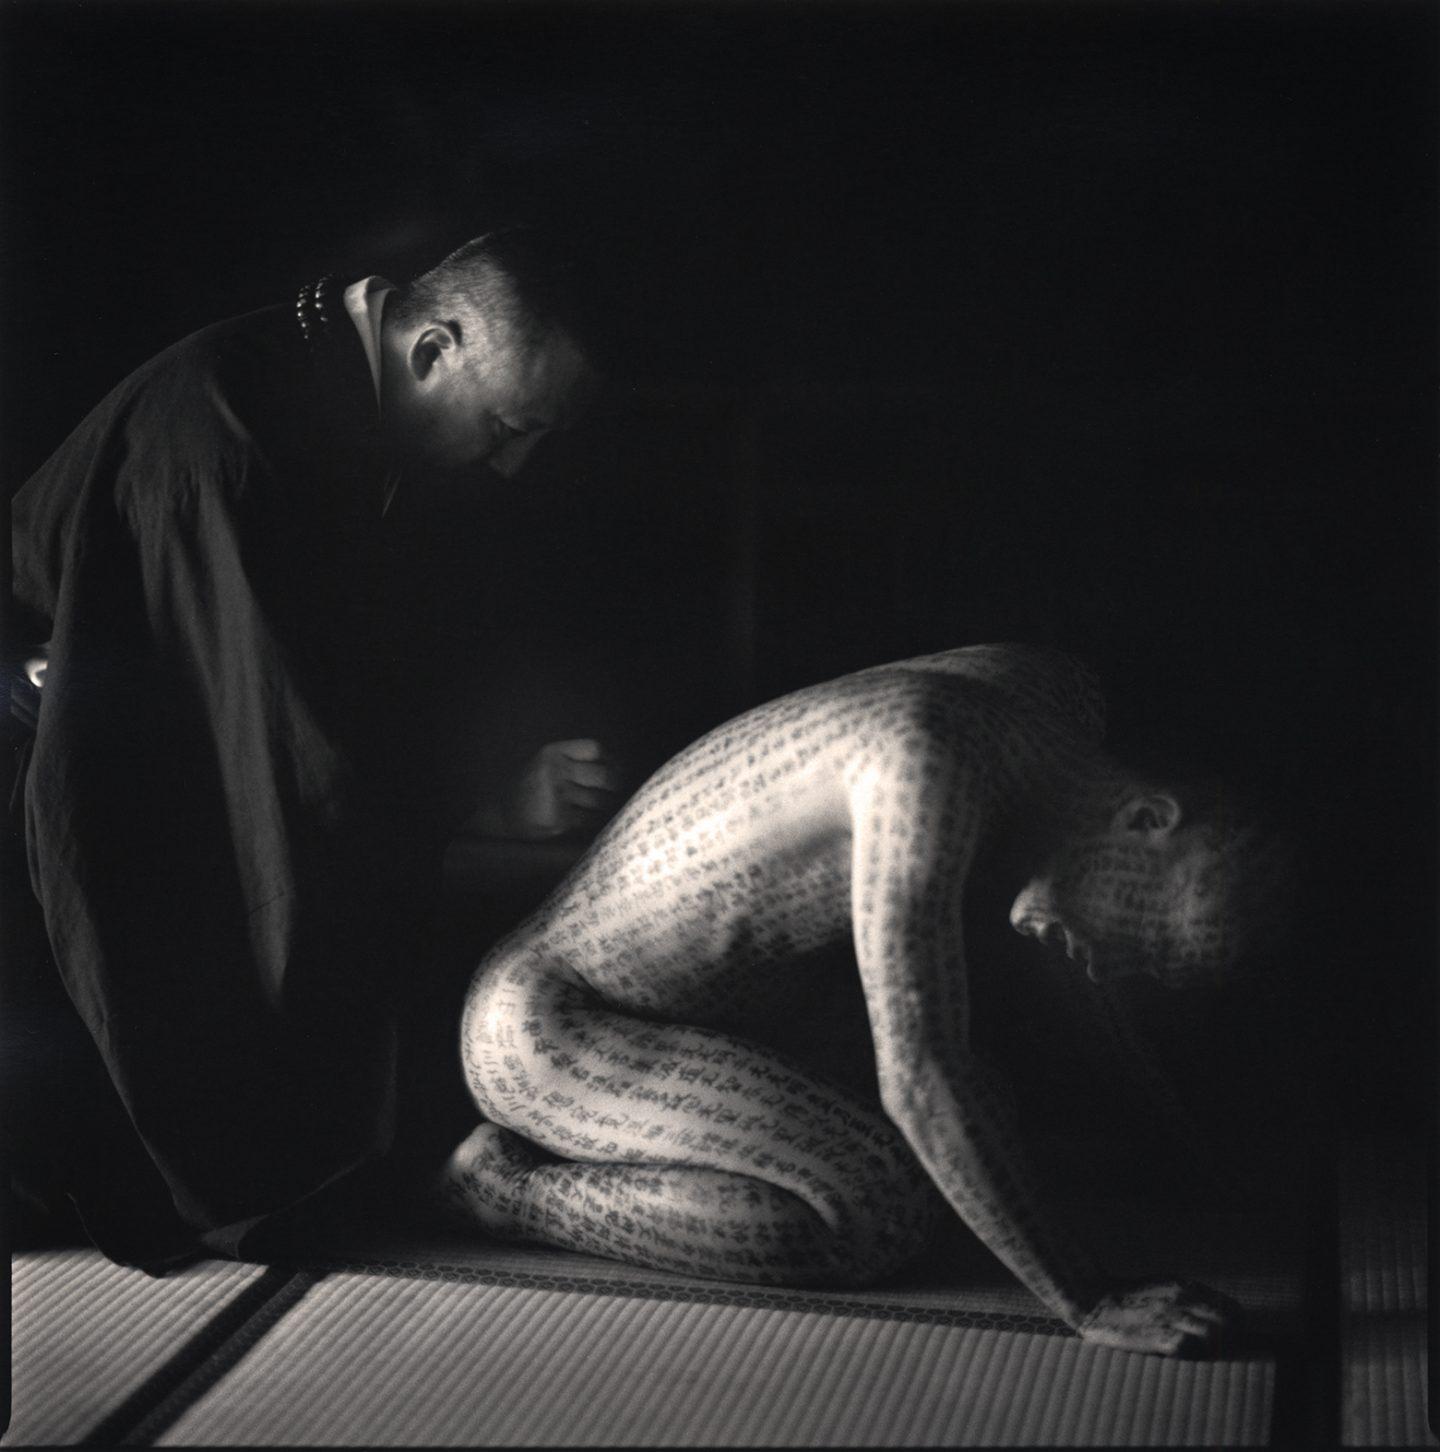 IGNANT-Photography-Hiroshi-Watanabe-Kwaidan-04